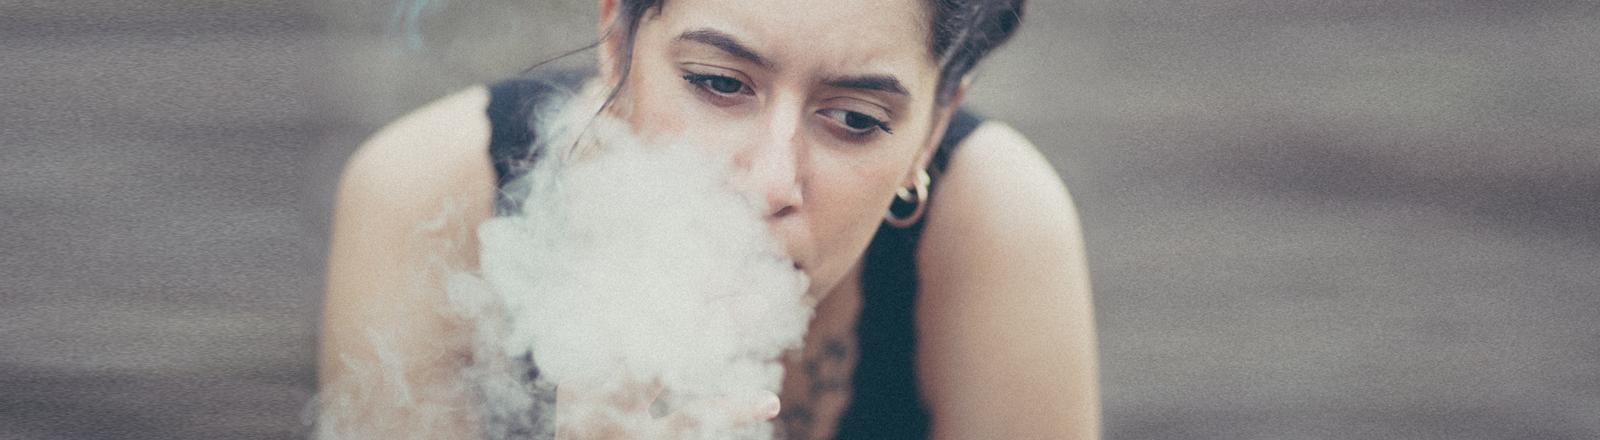 Eine Frau raucht